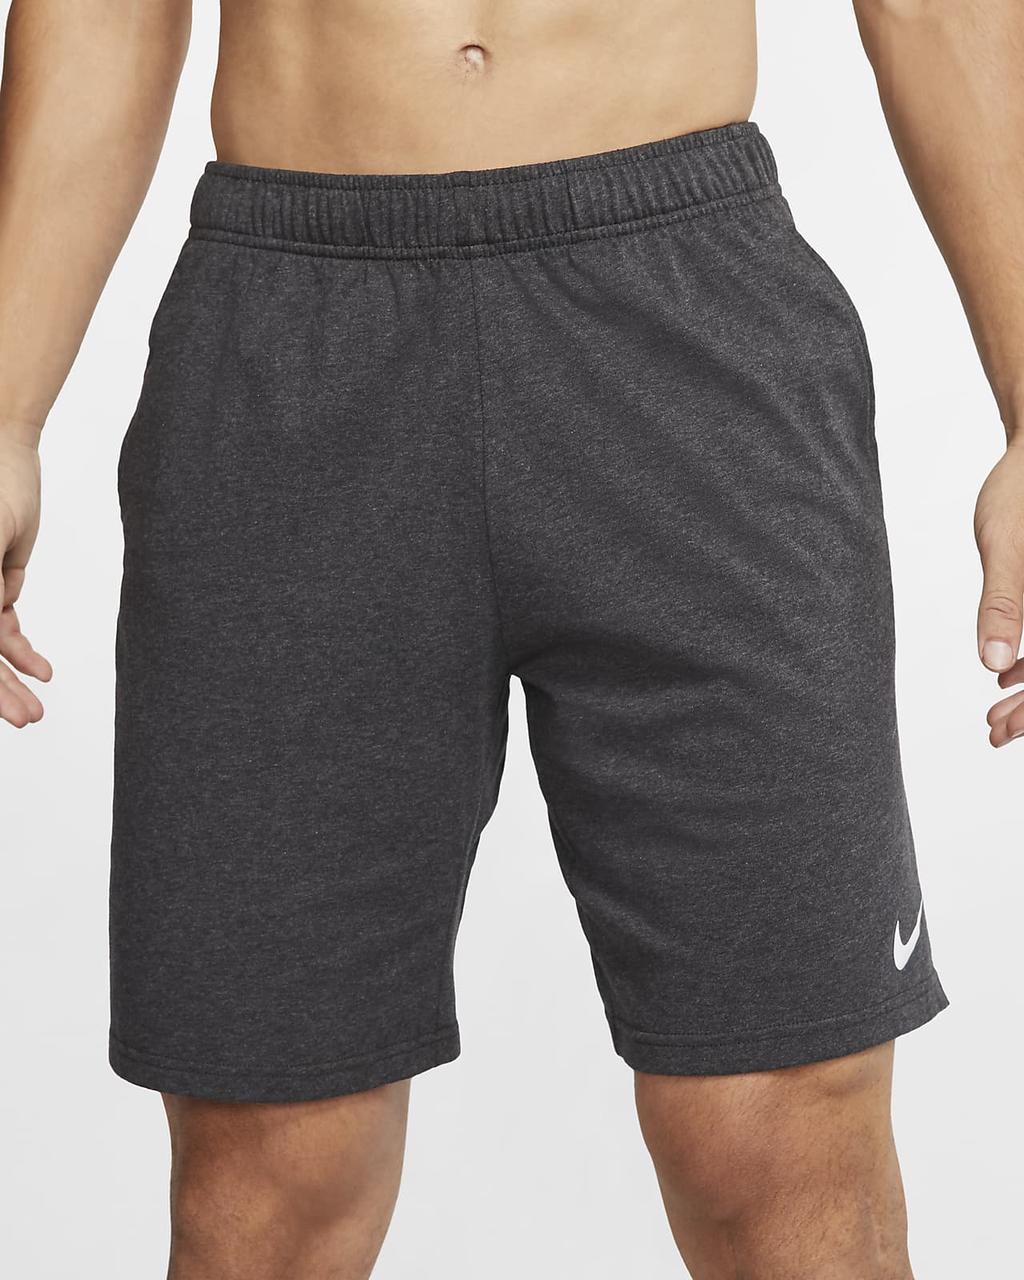 Шорты мужские Nike M Nk Dry Fit Cotton 2.0 серые (CJ2044-032)